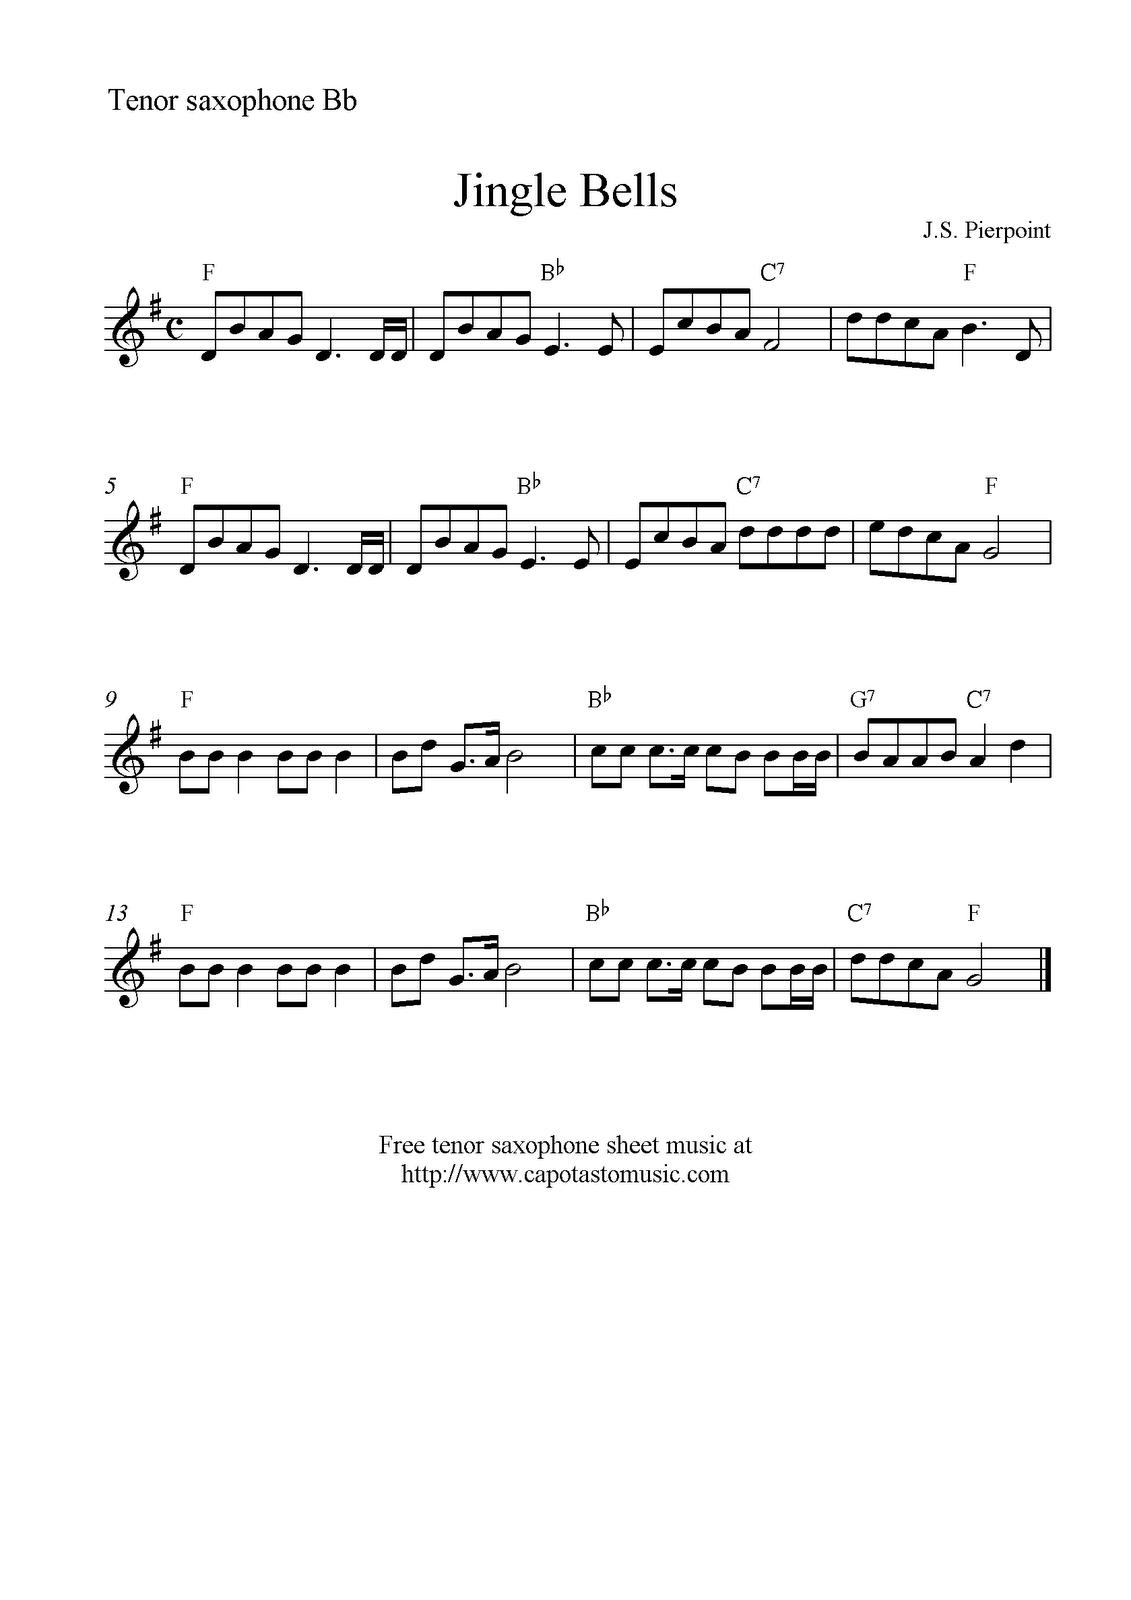 Sexy sax man sheet music images 39